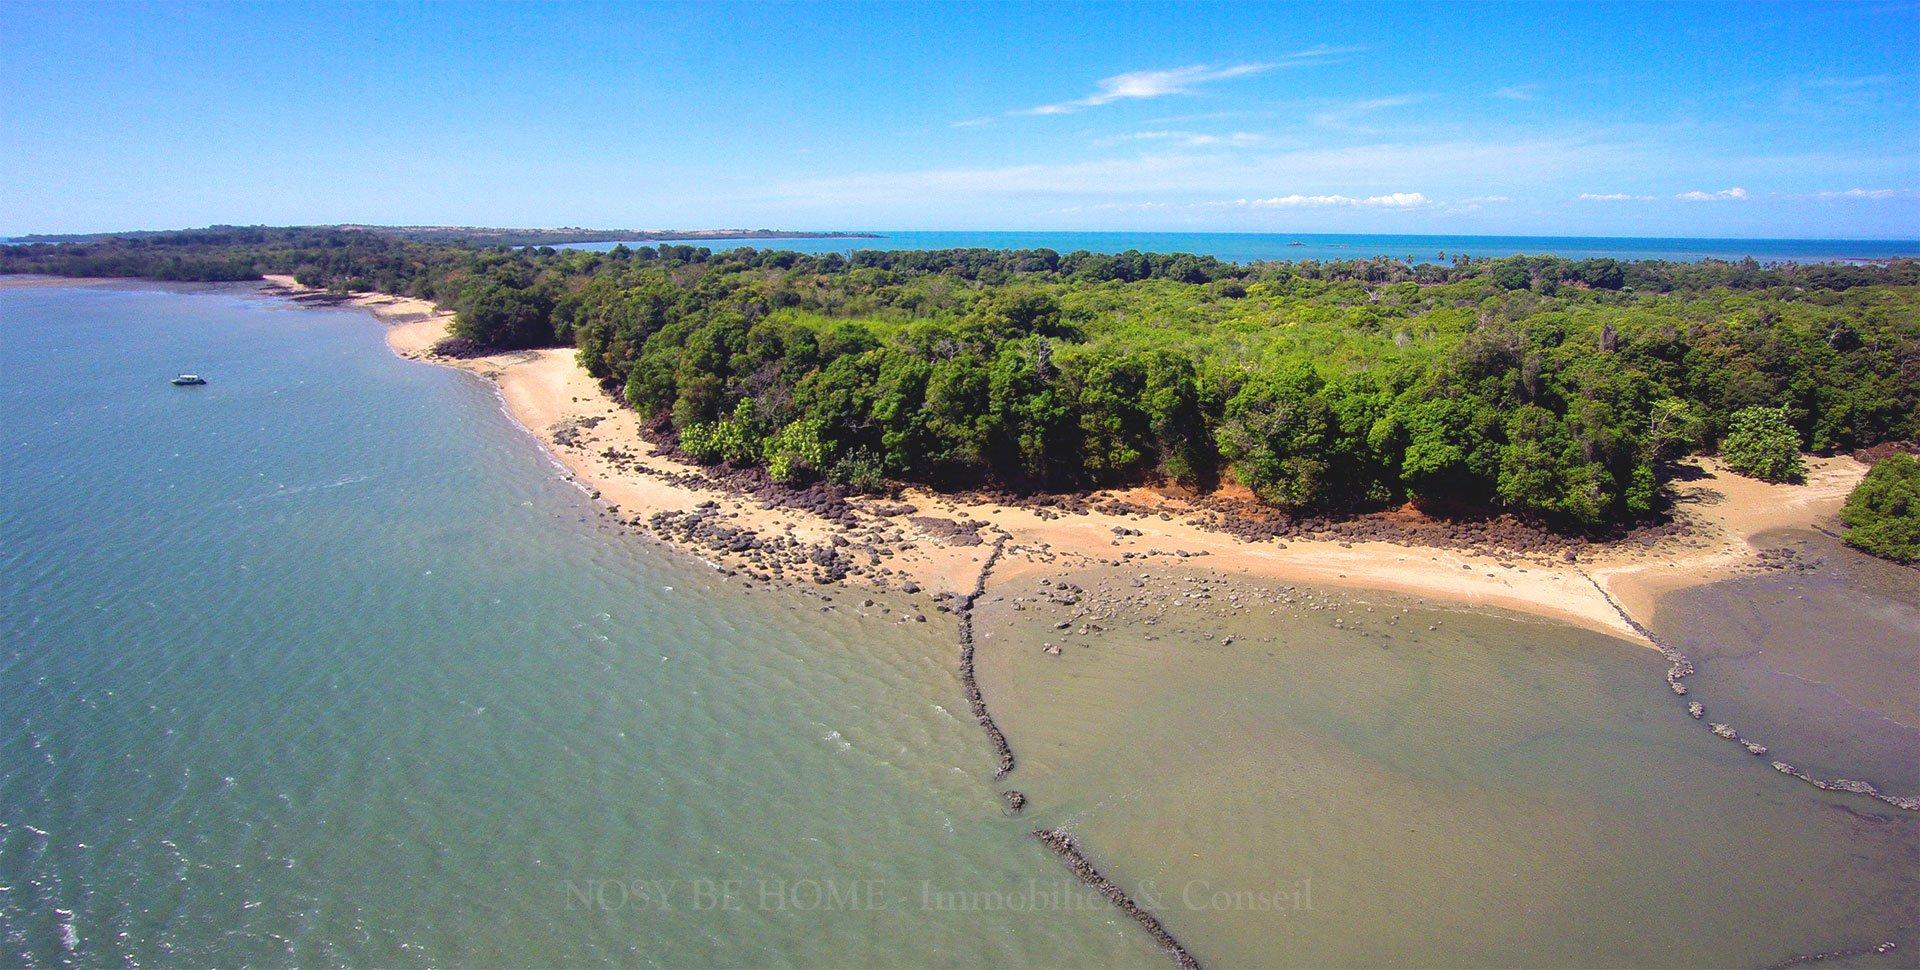 Sale Building land - Nosy Faly - Madagascar